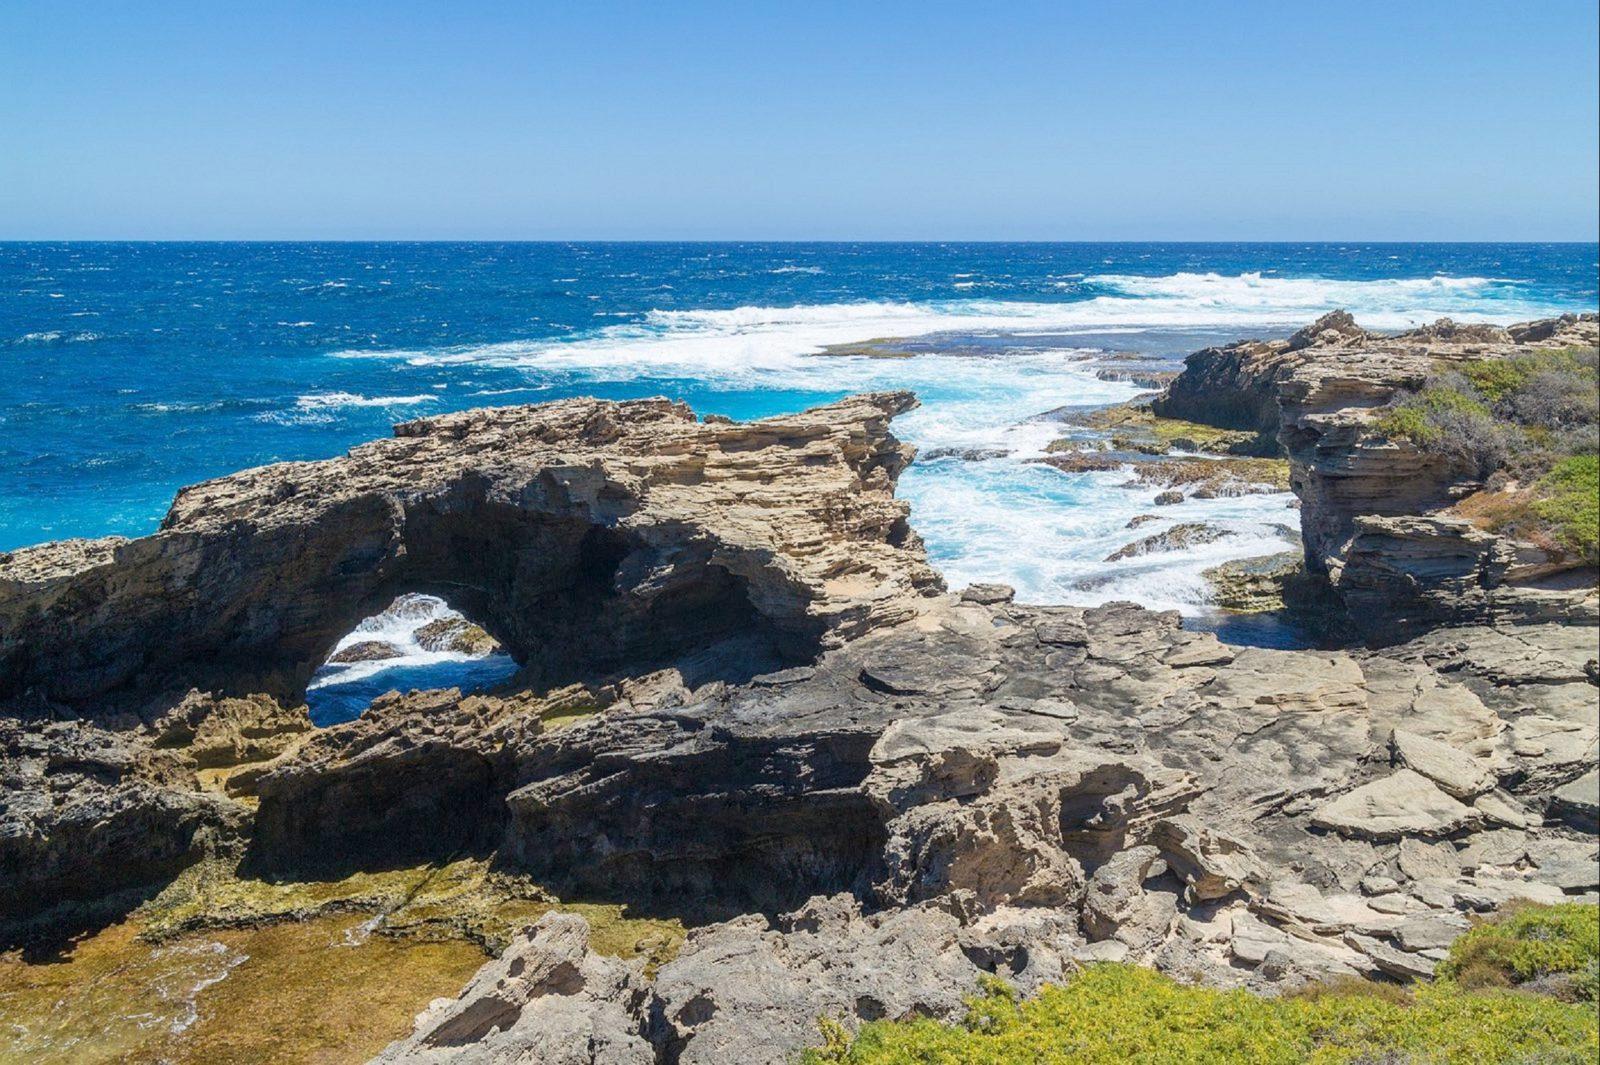 Cape Vlamingh, Rottnest Island, Western Australia